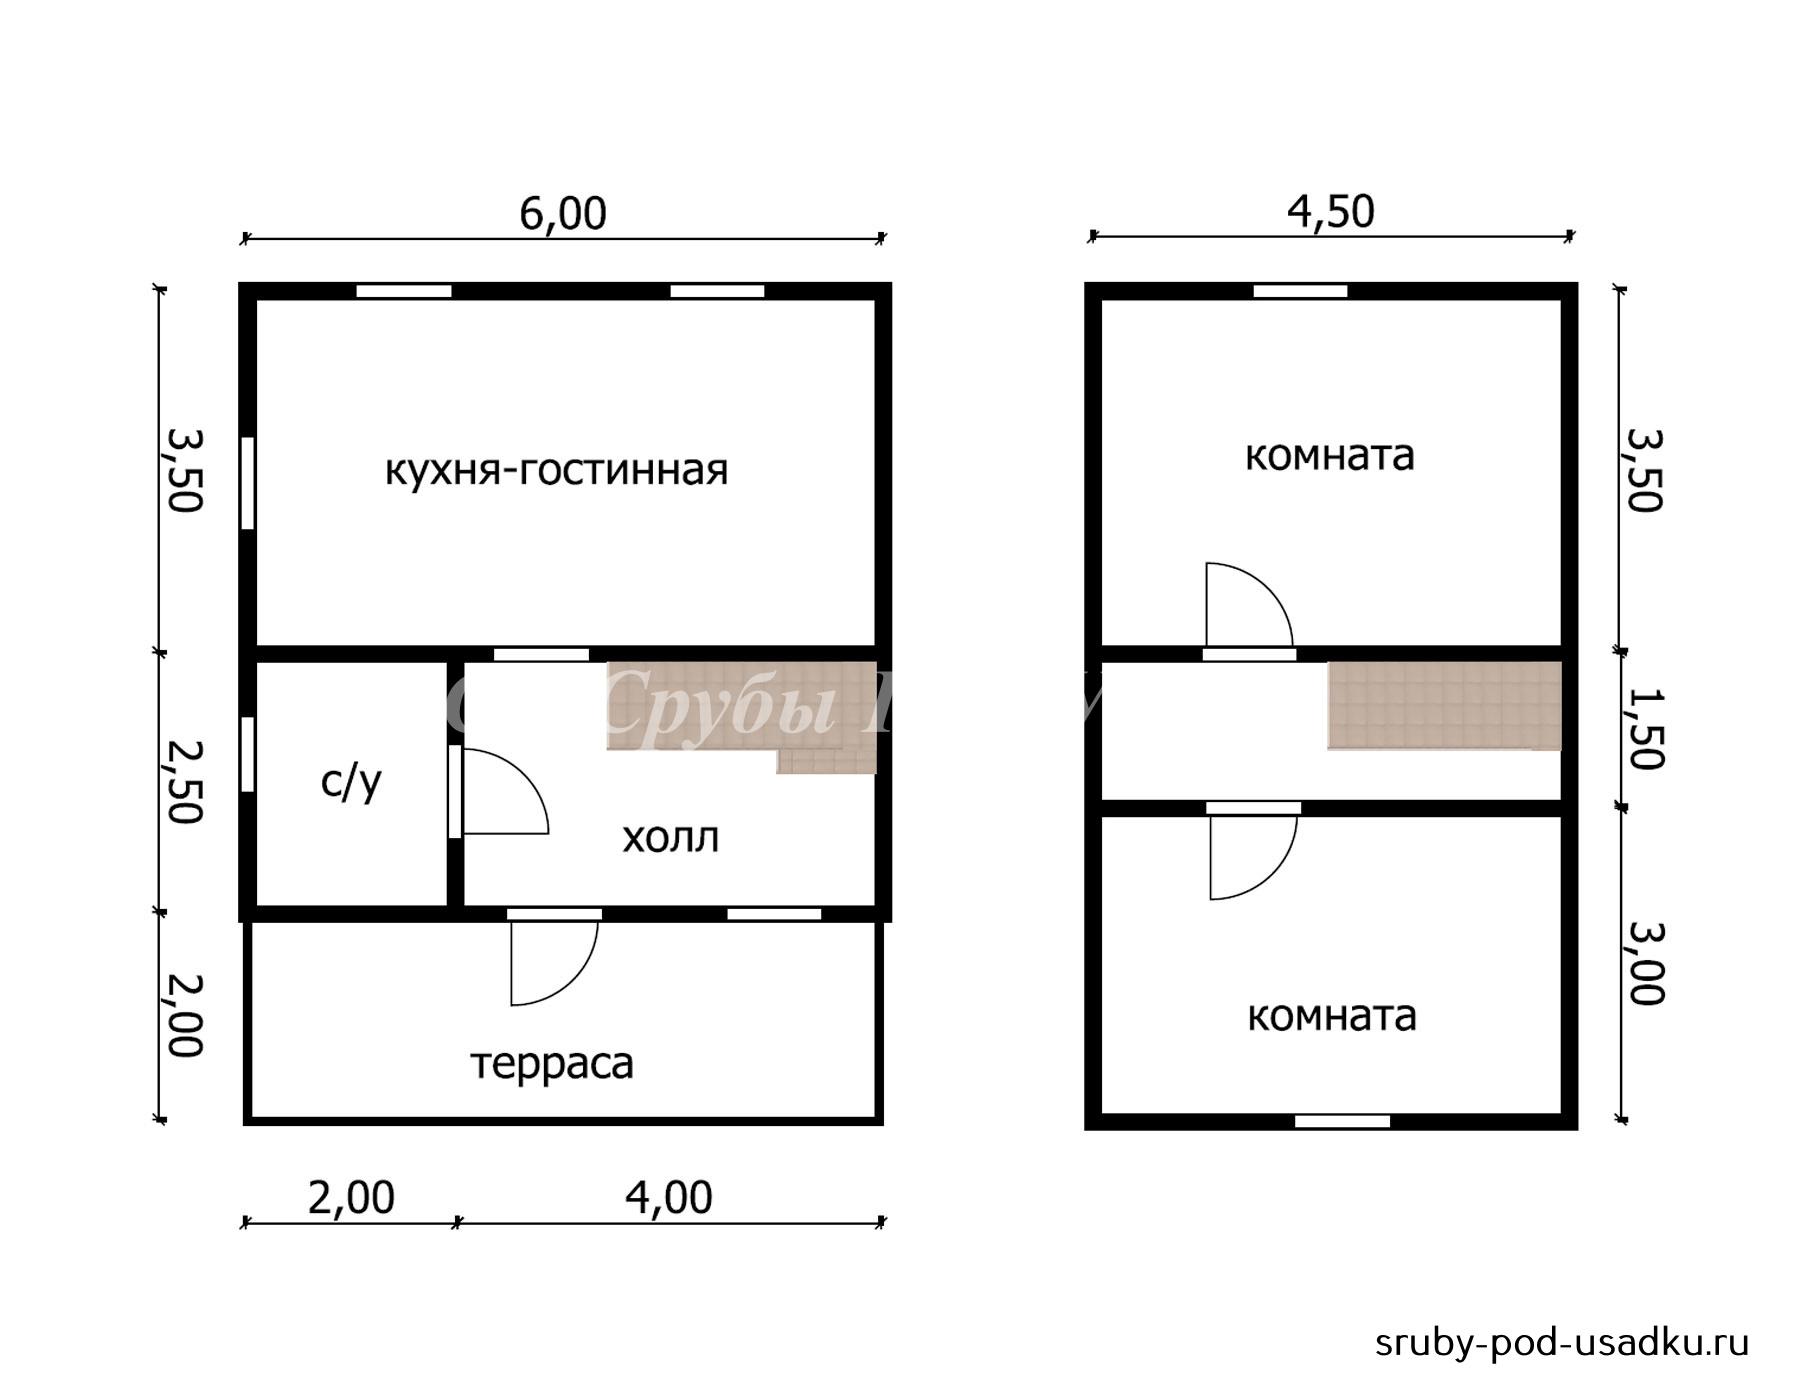 Дом из бруса под усадку 6х8 №45